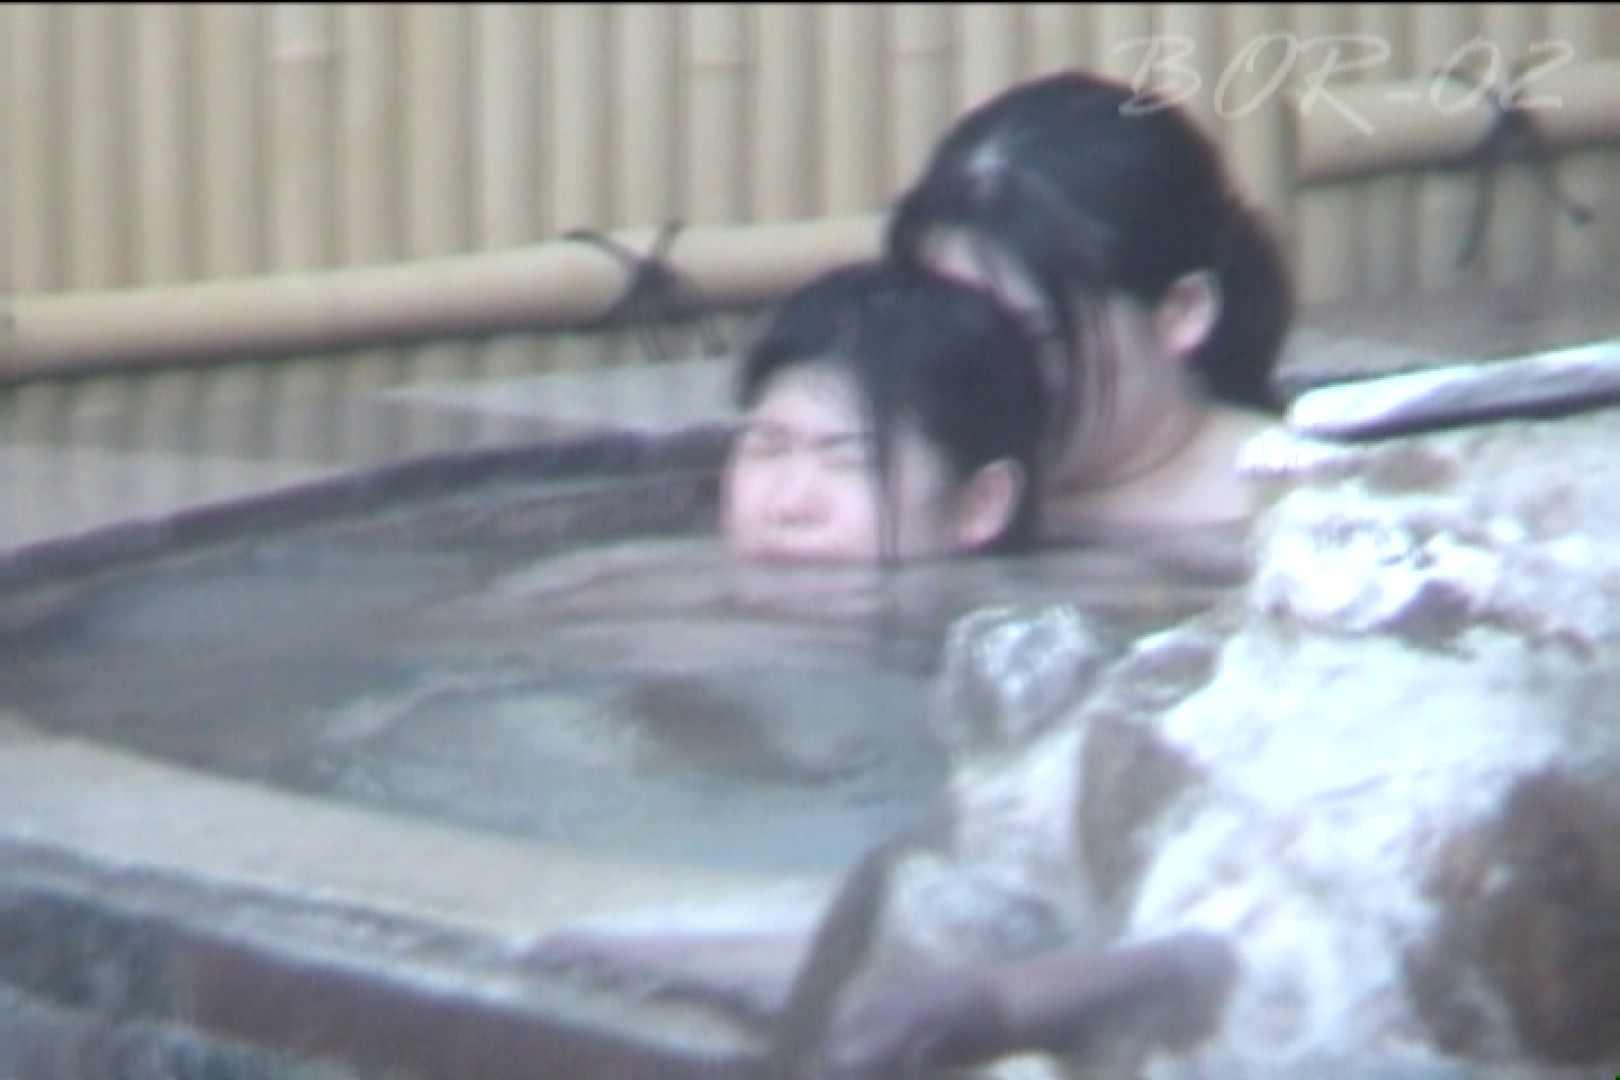 Aquaな露天風呂Vol.471 盗撮 | HなOL  66pic 32